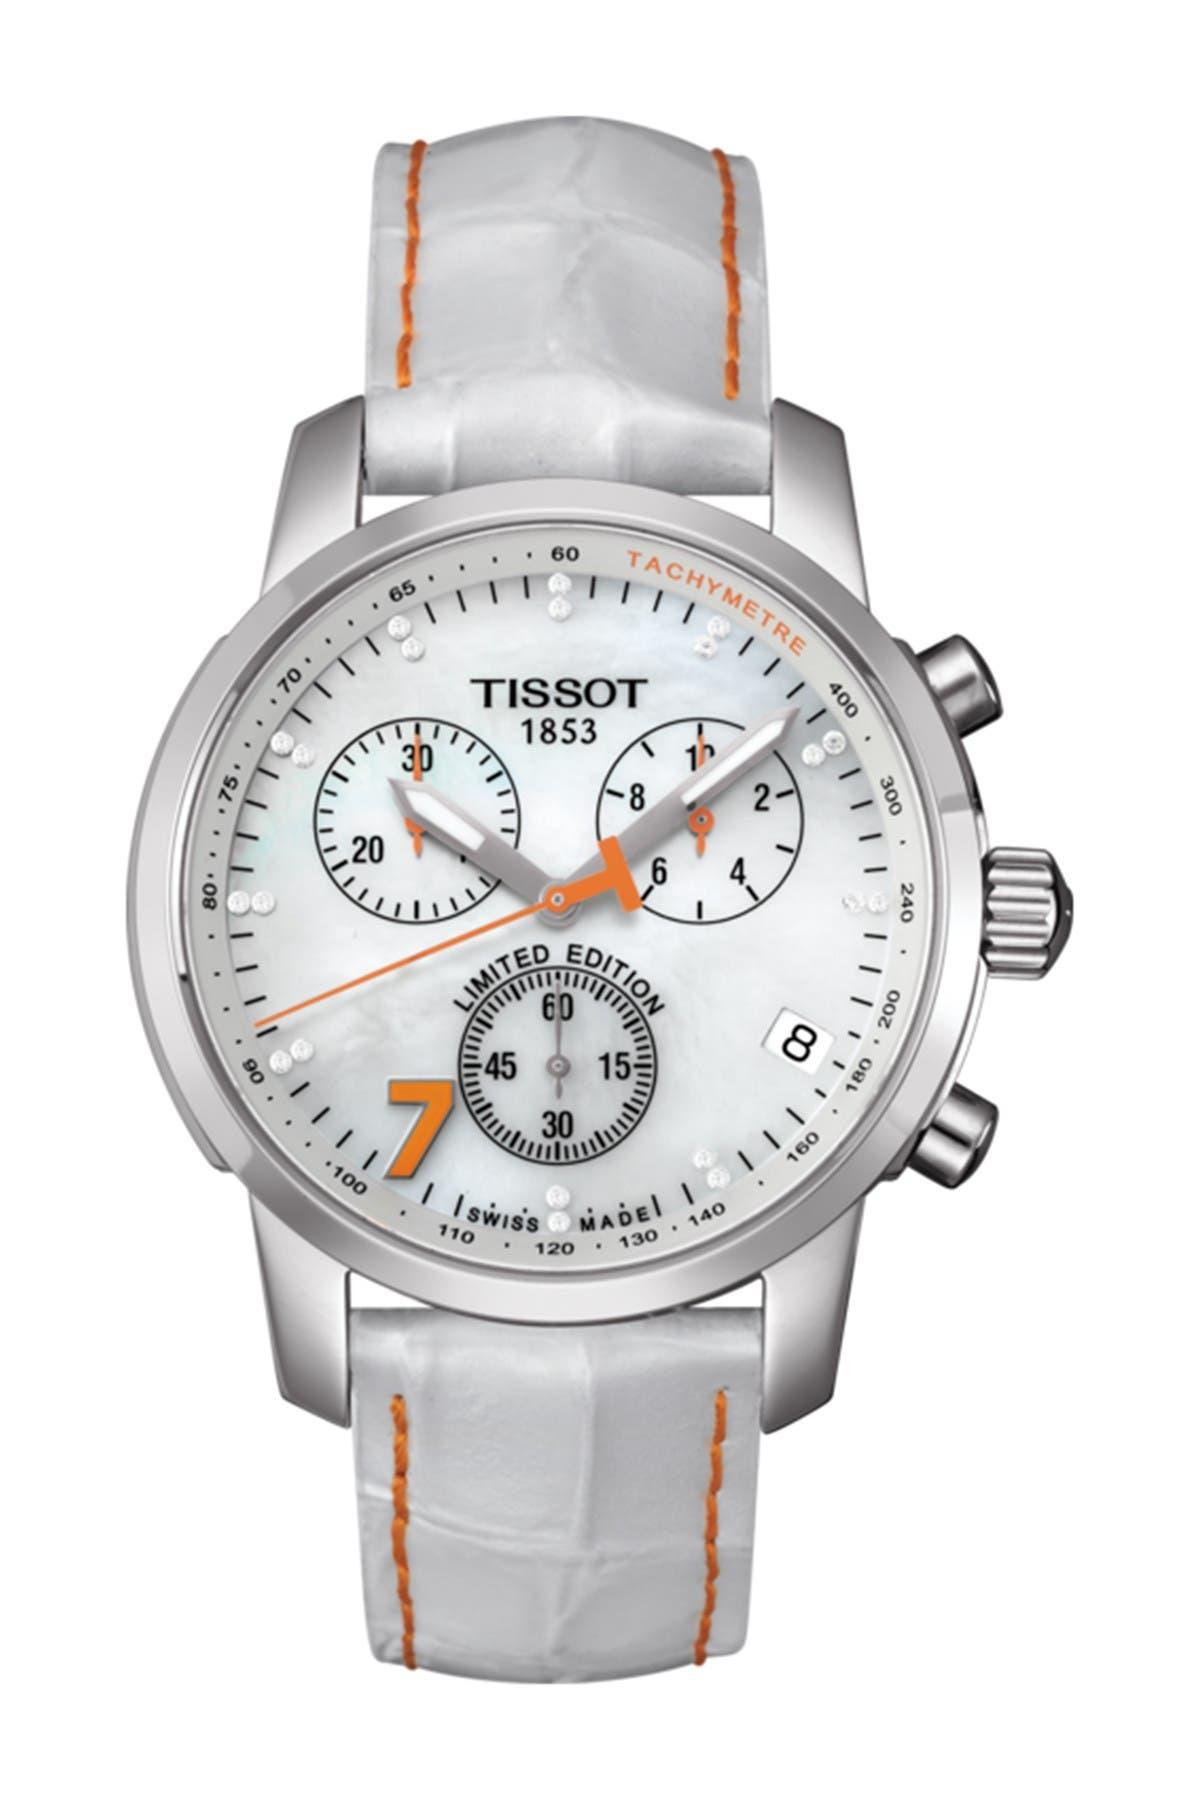 Image of Tissot Women's PRC 200 Danicca Patrick Diamond Watch, 43mm - 0.086 ctw